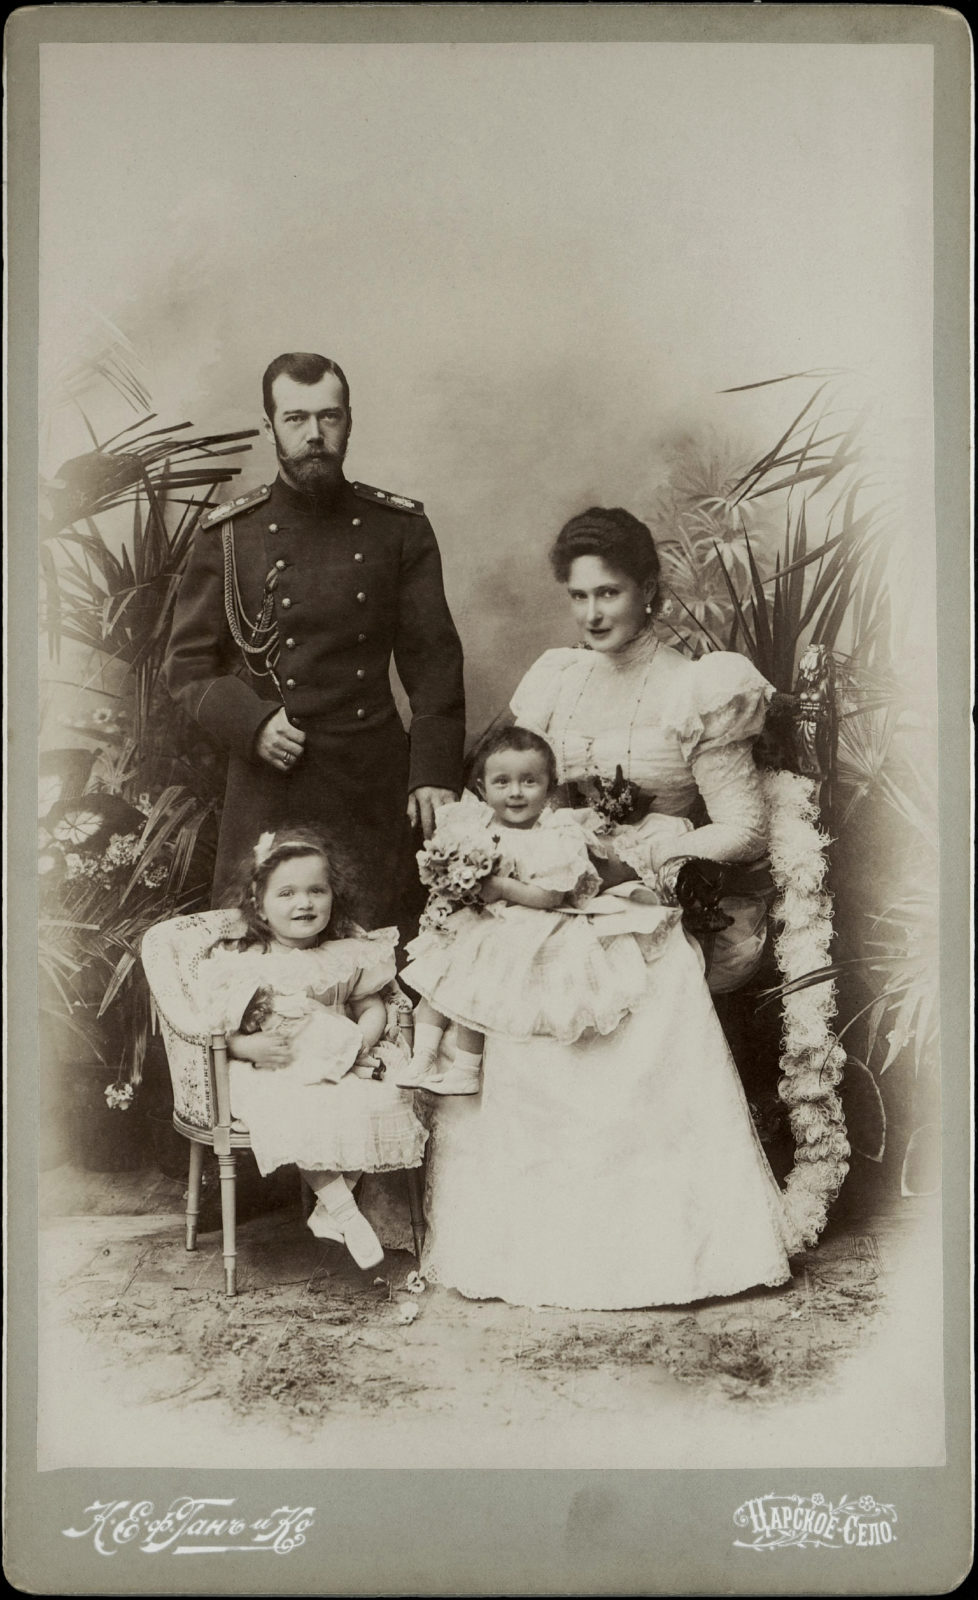 Emperor Nicholas II and Empress Alexandra Feodorovna with Grand Duchesses Olga and Tatiana.1898.